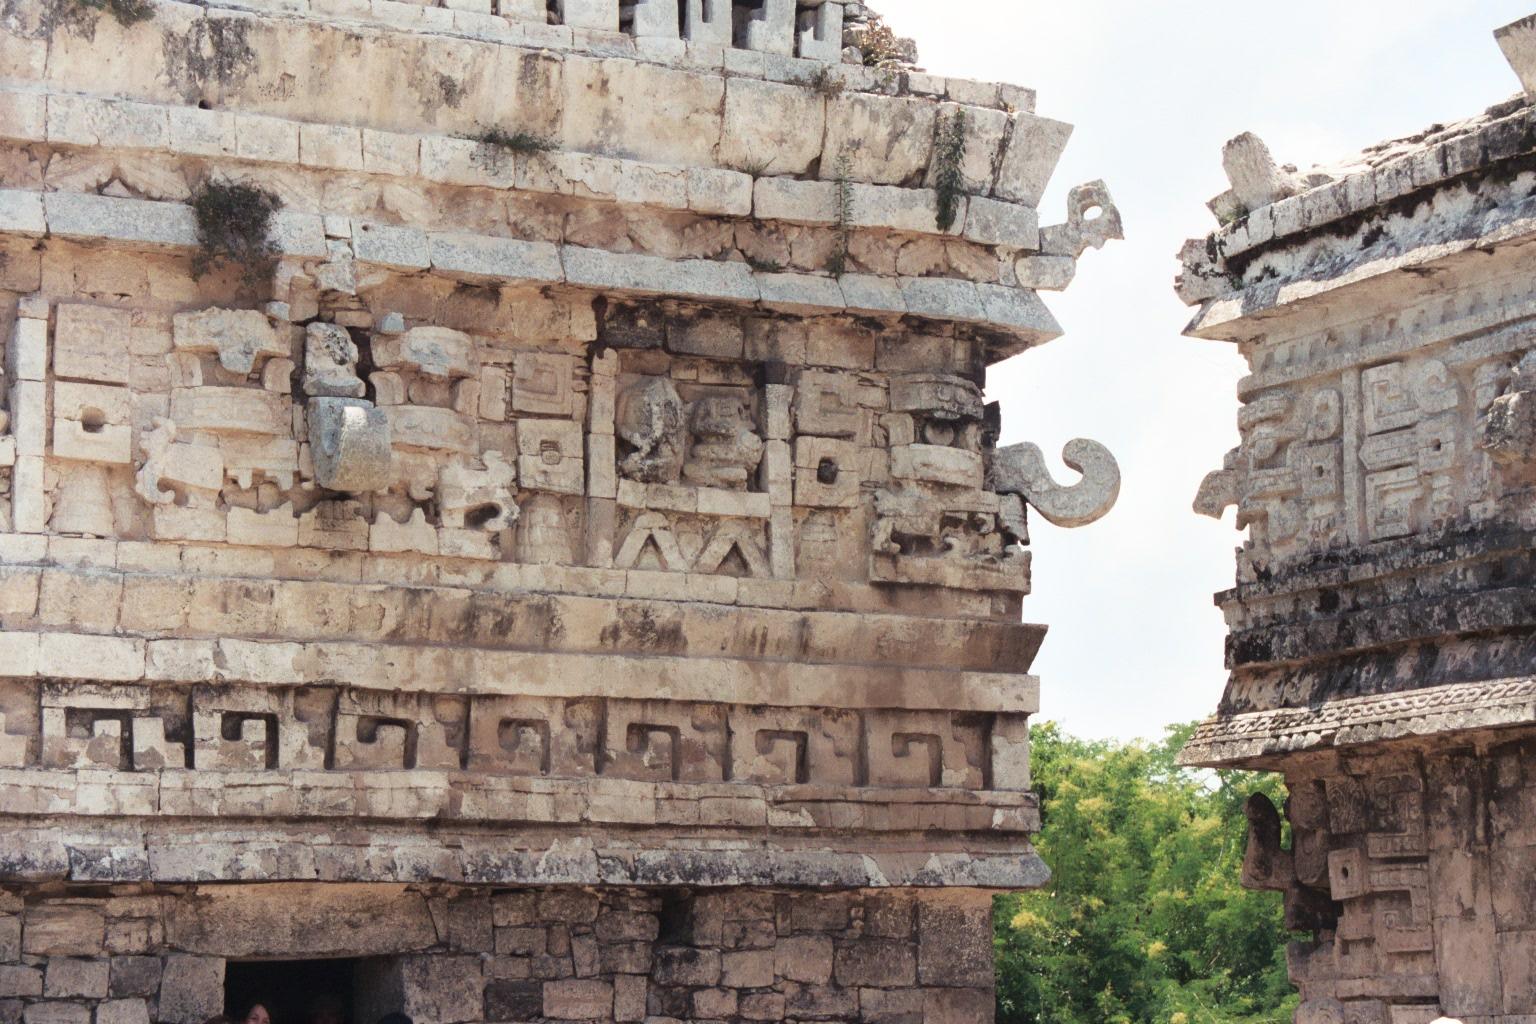 mayan architecture in chichen itza, mexico | weatherstone's blog